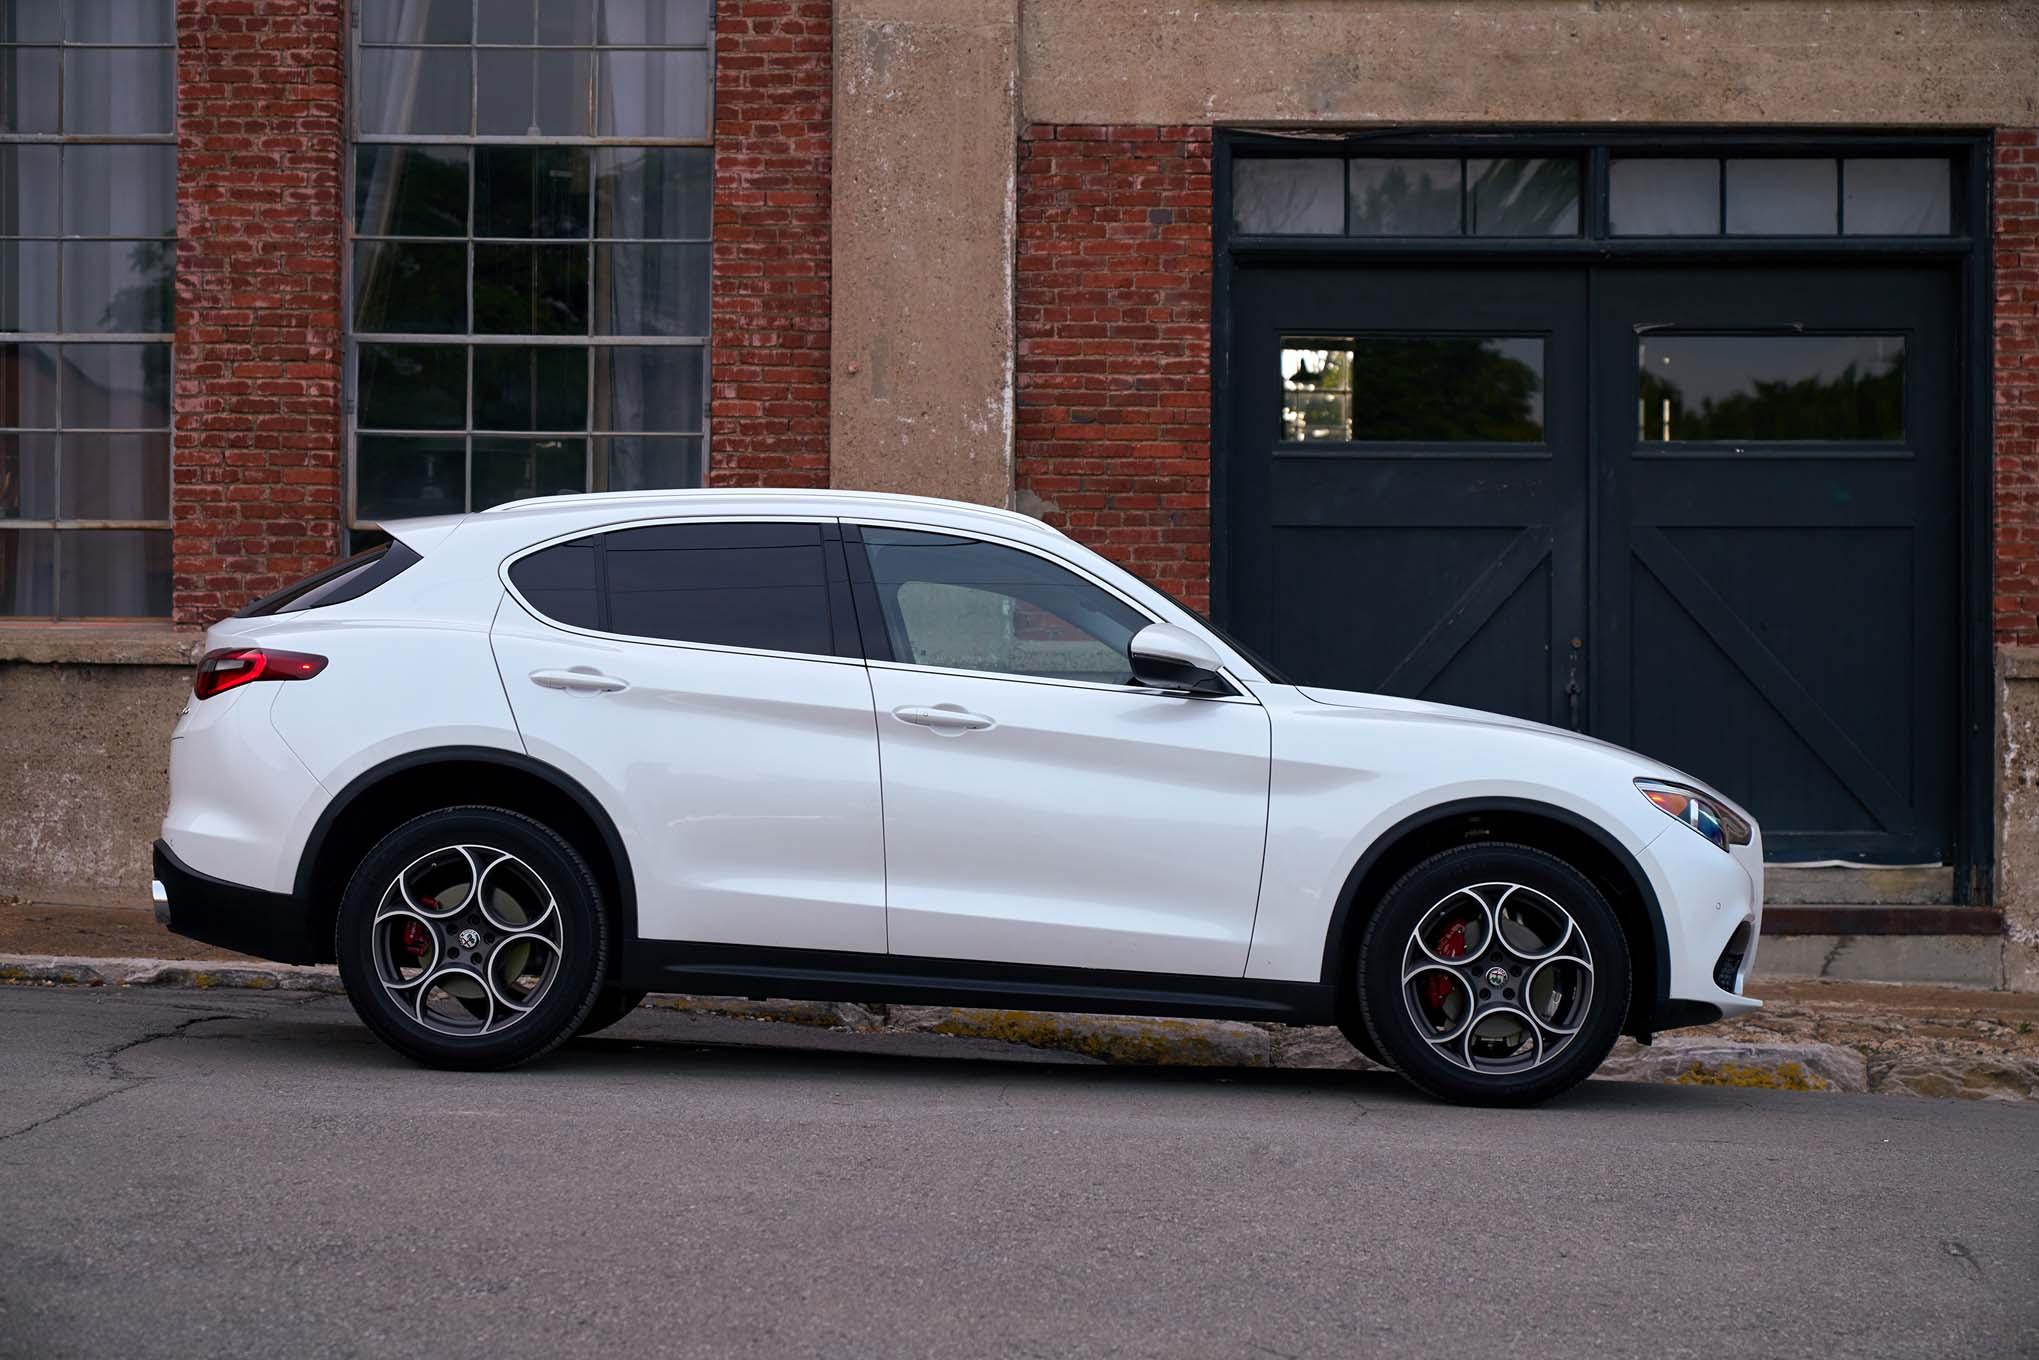 9 Passenger Suv >> 2018 Alfa Romeo Stelvio First Drive | Automobile Magazine